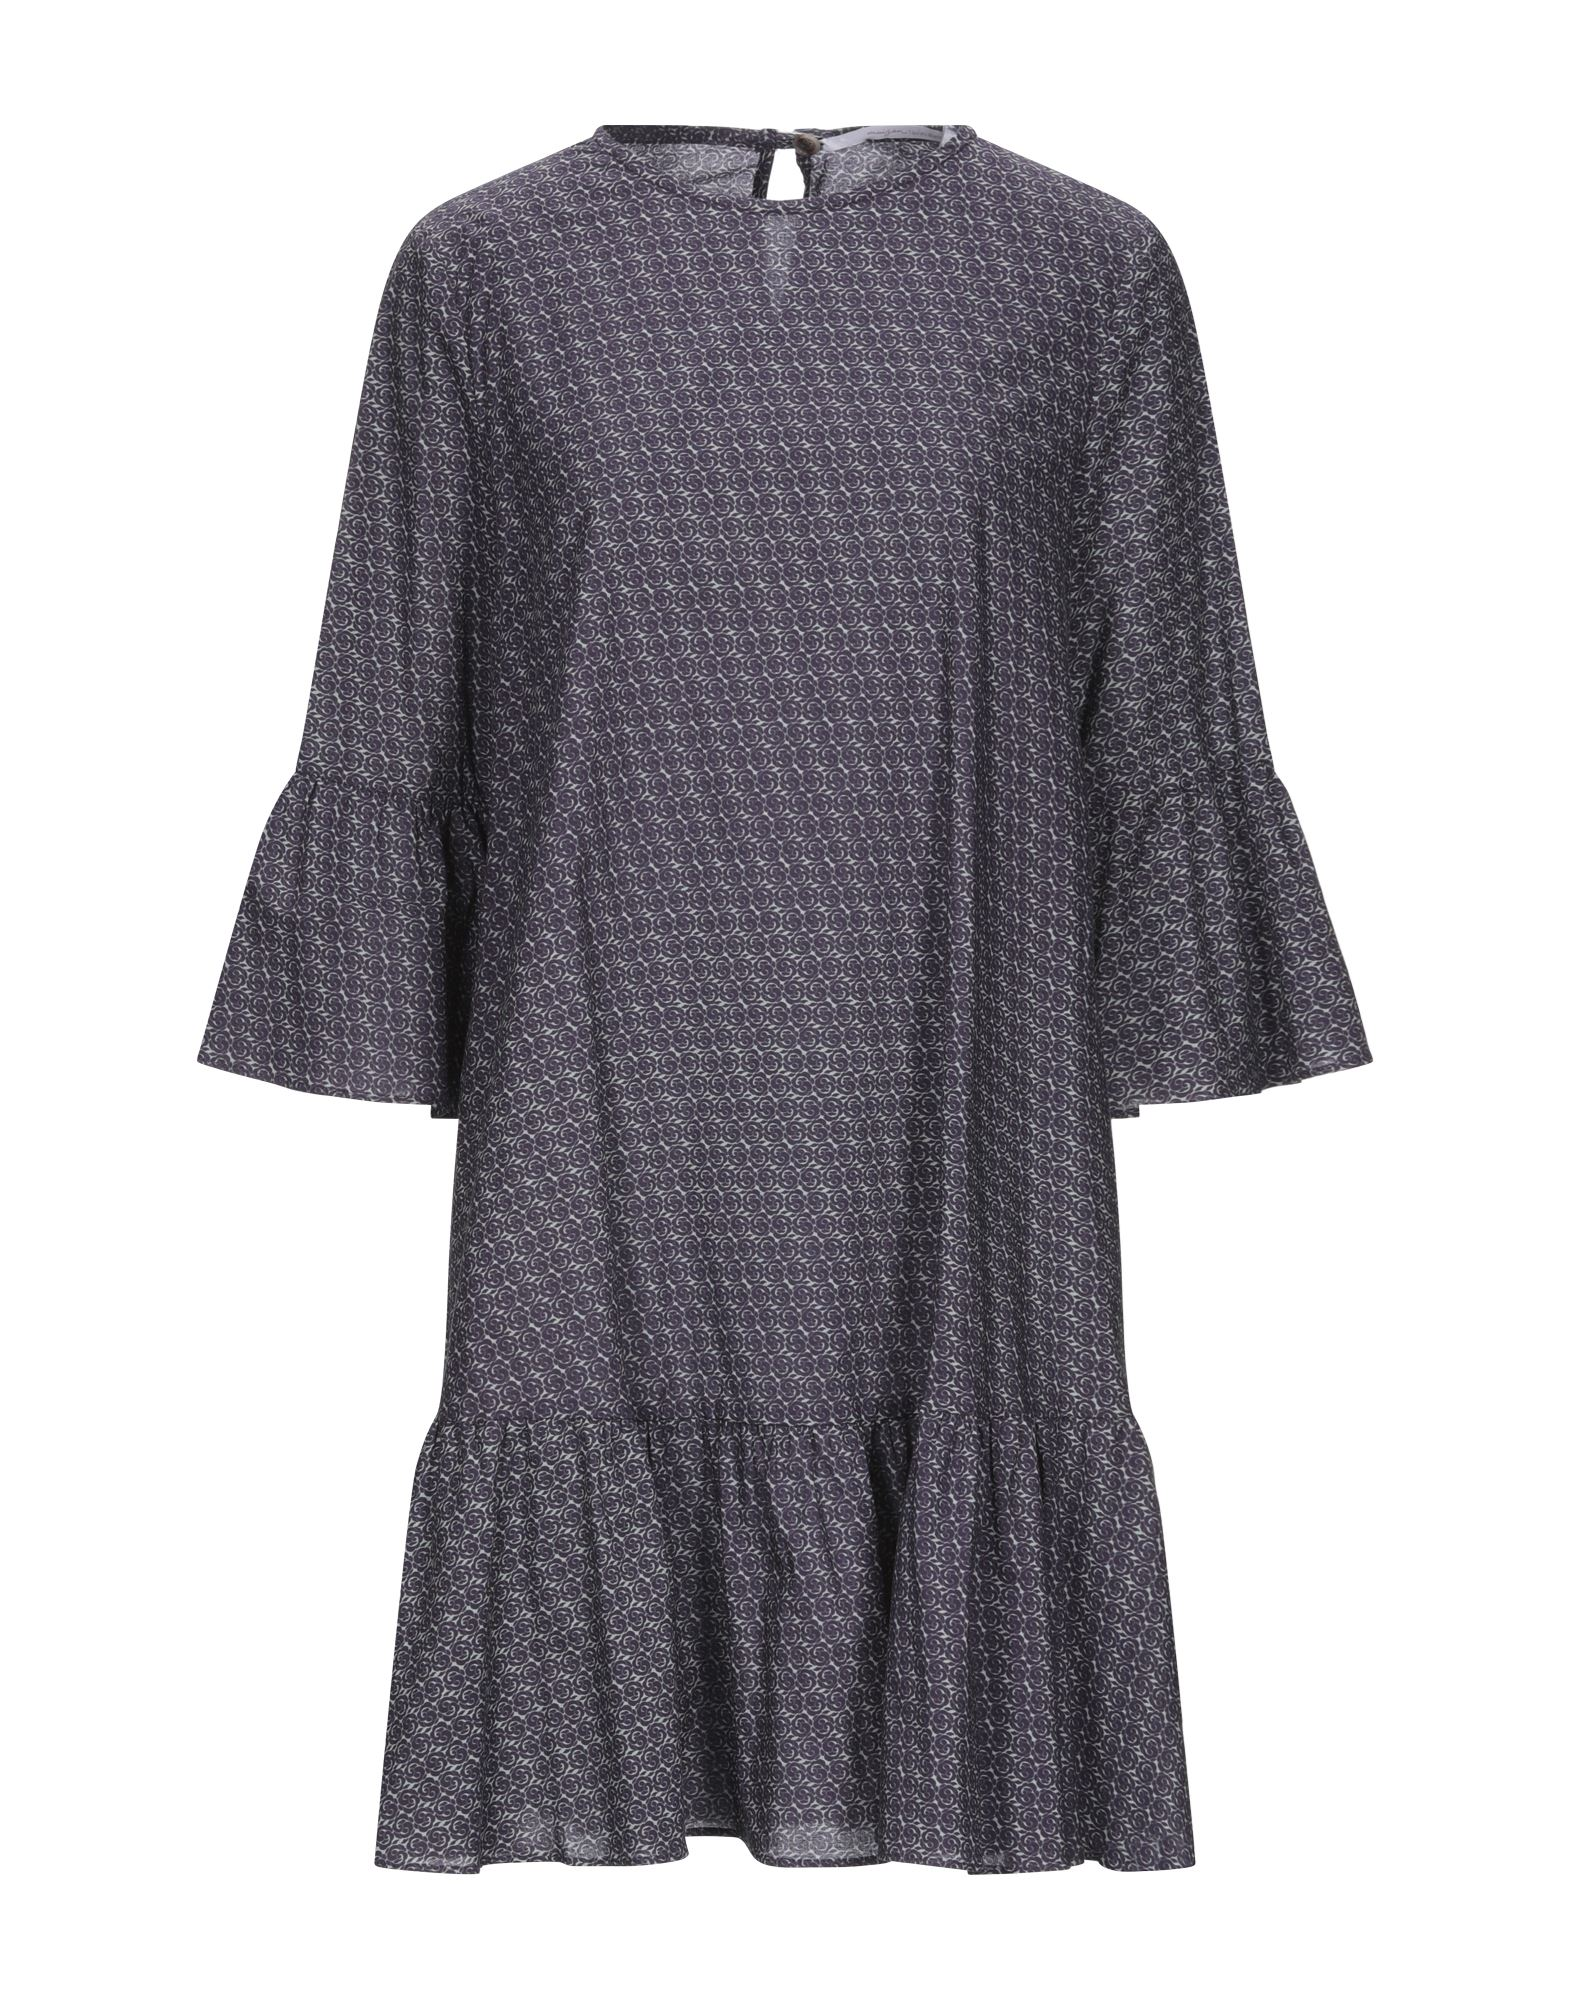 MAISON LAVINIATURRA Короткое платье maison laviniaturra блузка